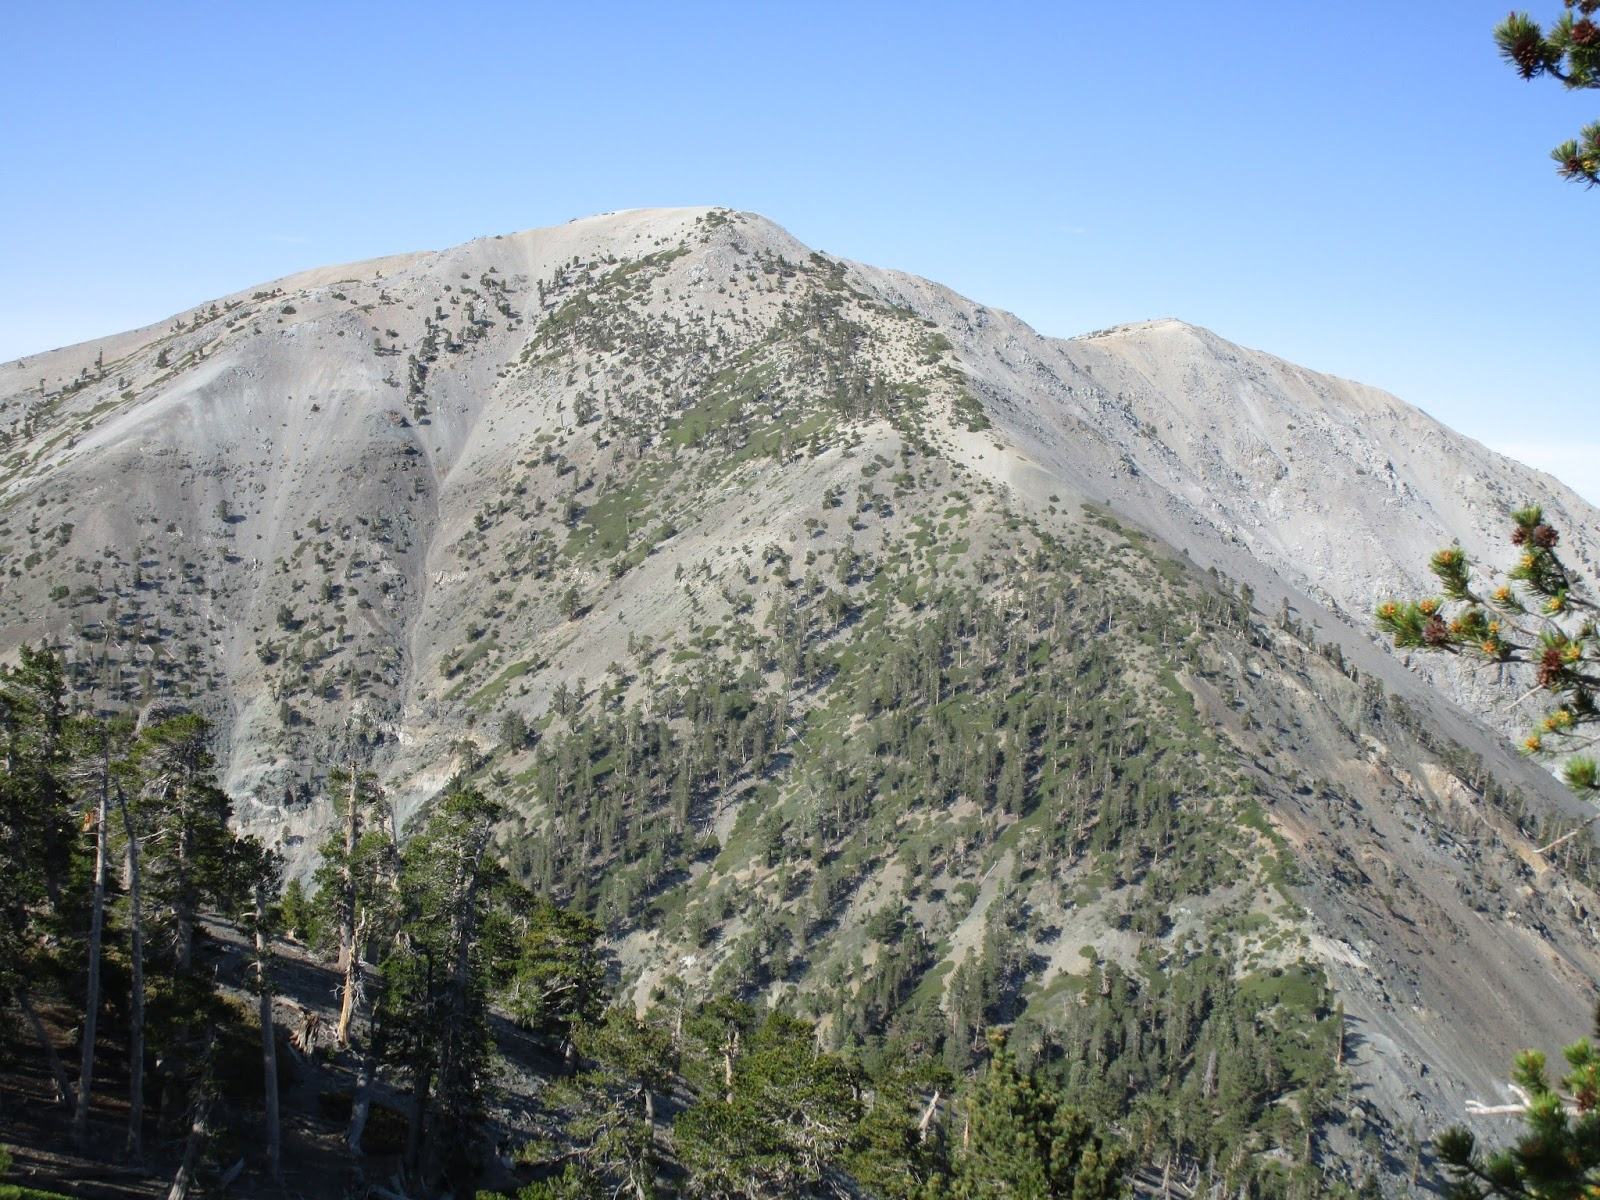 singles in mt baldy San bernardino mountains & favorite views:  mt baldy resort best viewing:  mountain singles operation provider in rim forest.